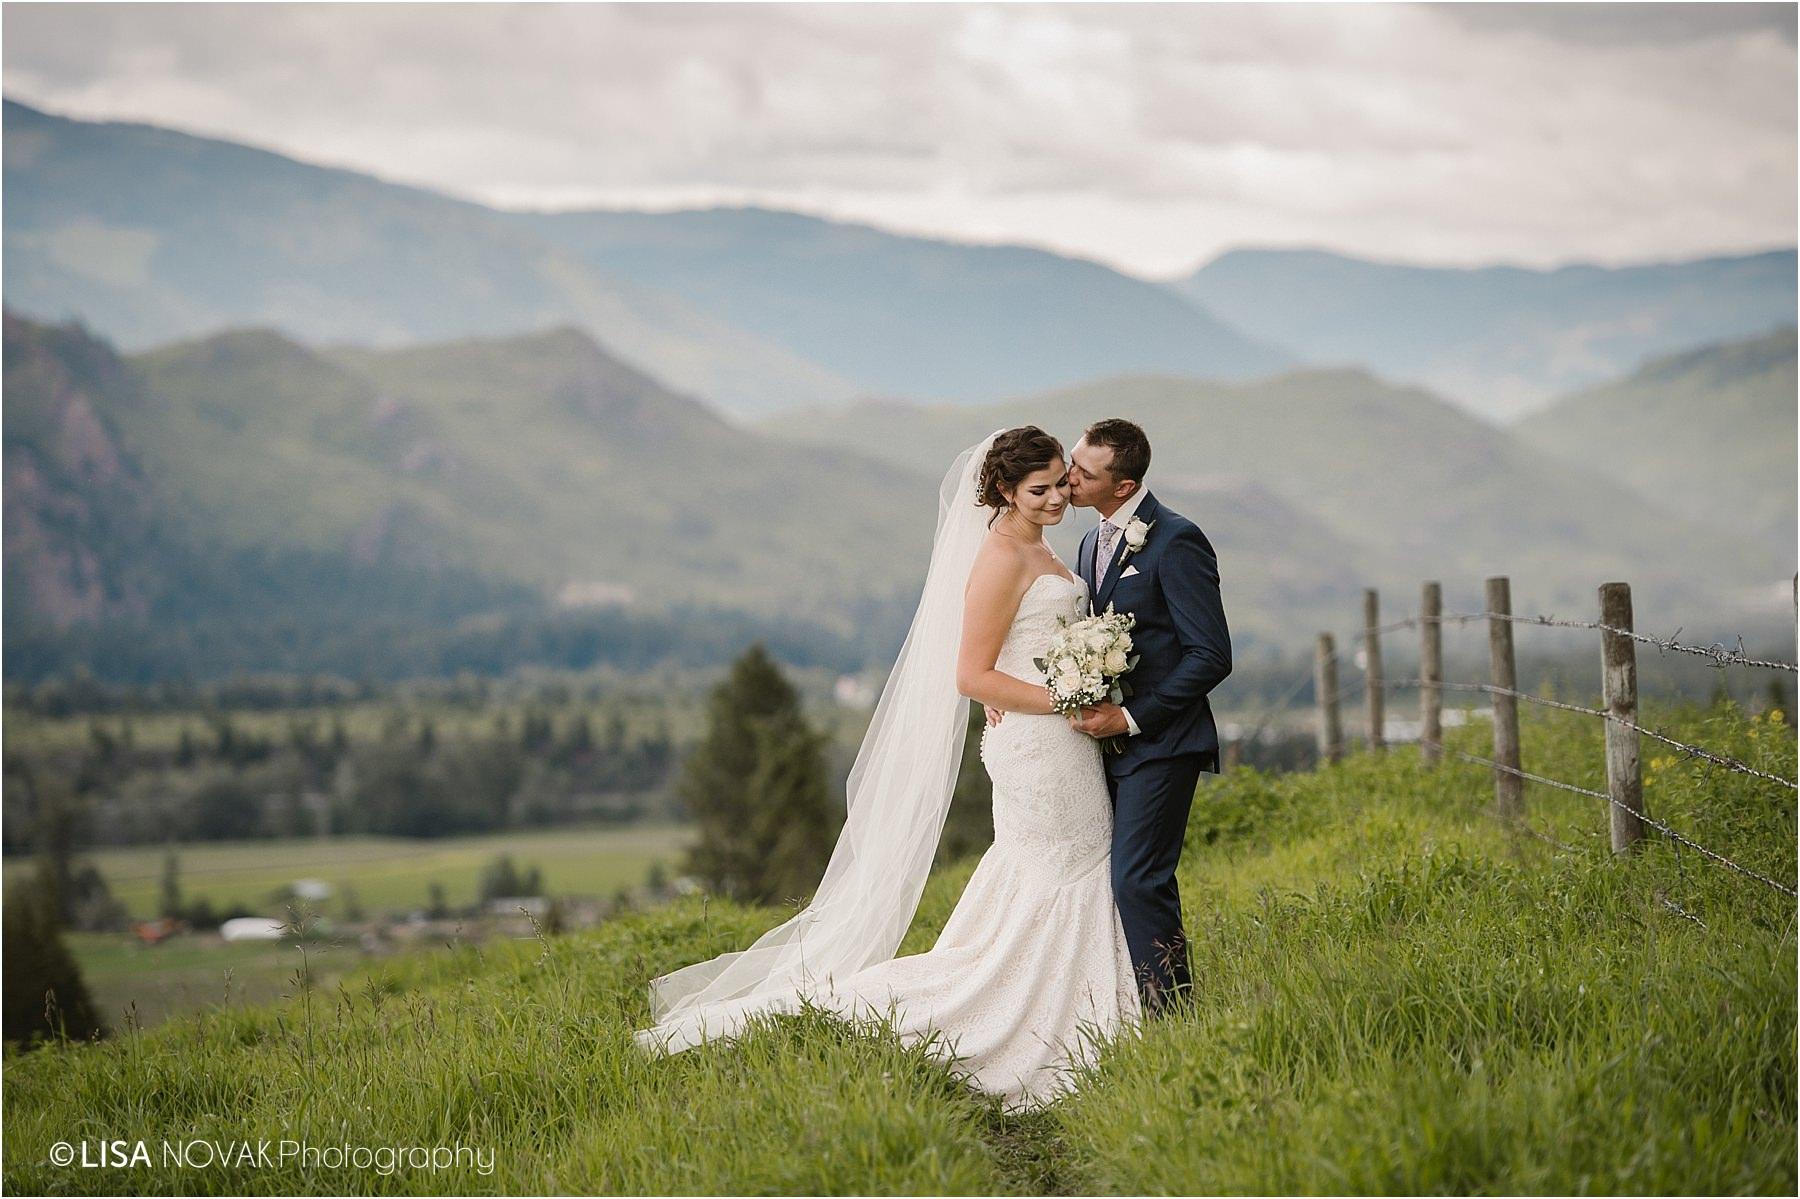 Okanagan wedding photographer BC Interior bride groom romantic epic mountain bridal portraits intimate BC summer wedding